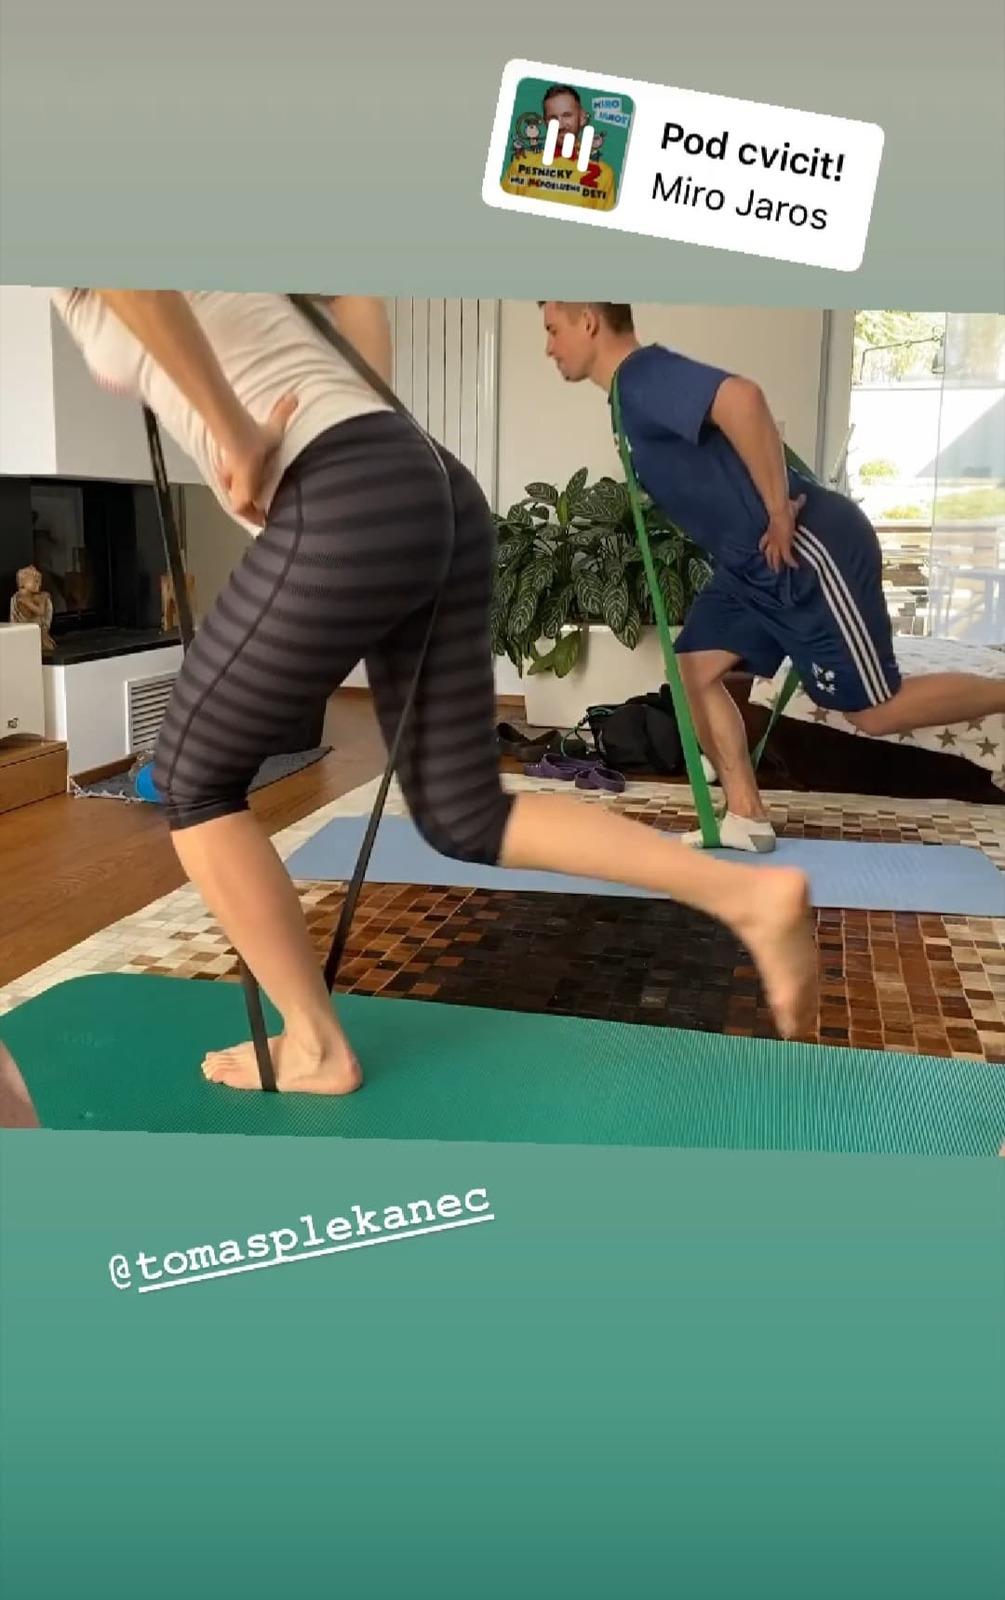 Pár si zacvičil i s odporovými gumami